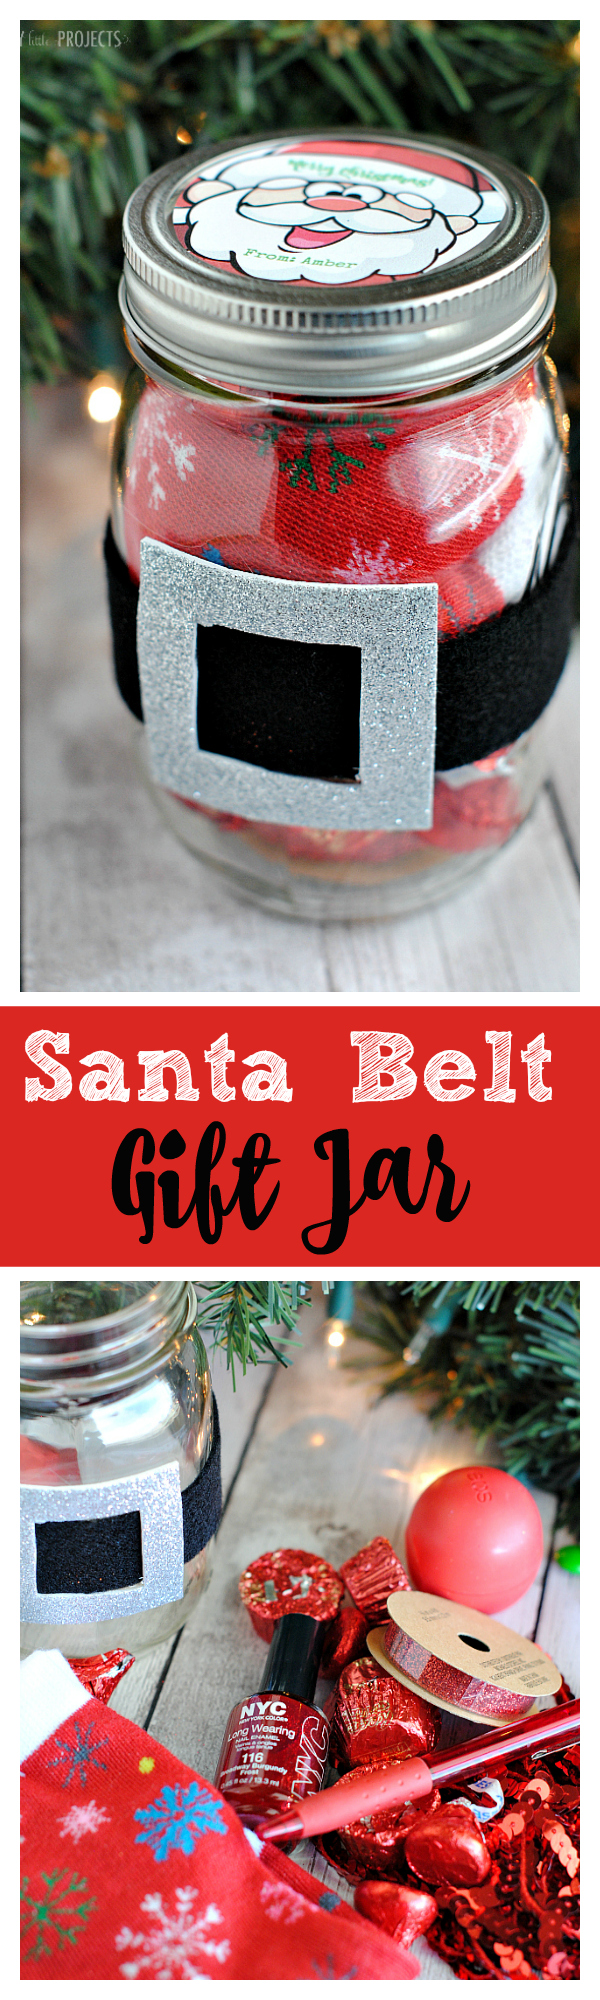 Cute Gift Idea for Friends or Neighbors-Santa Belt Gift Jar